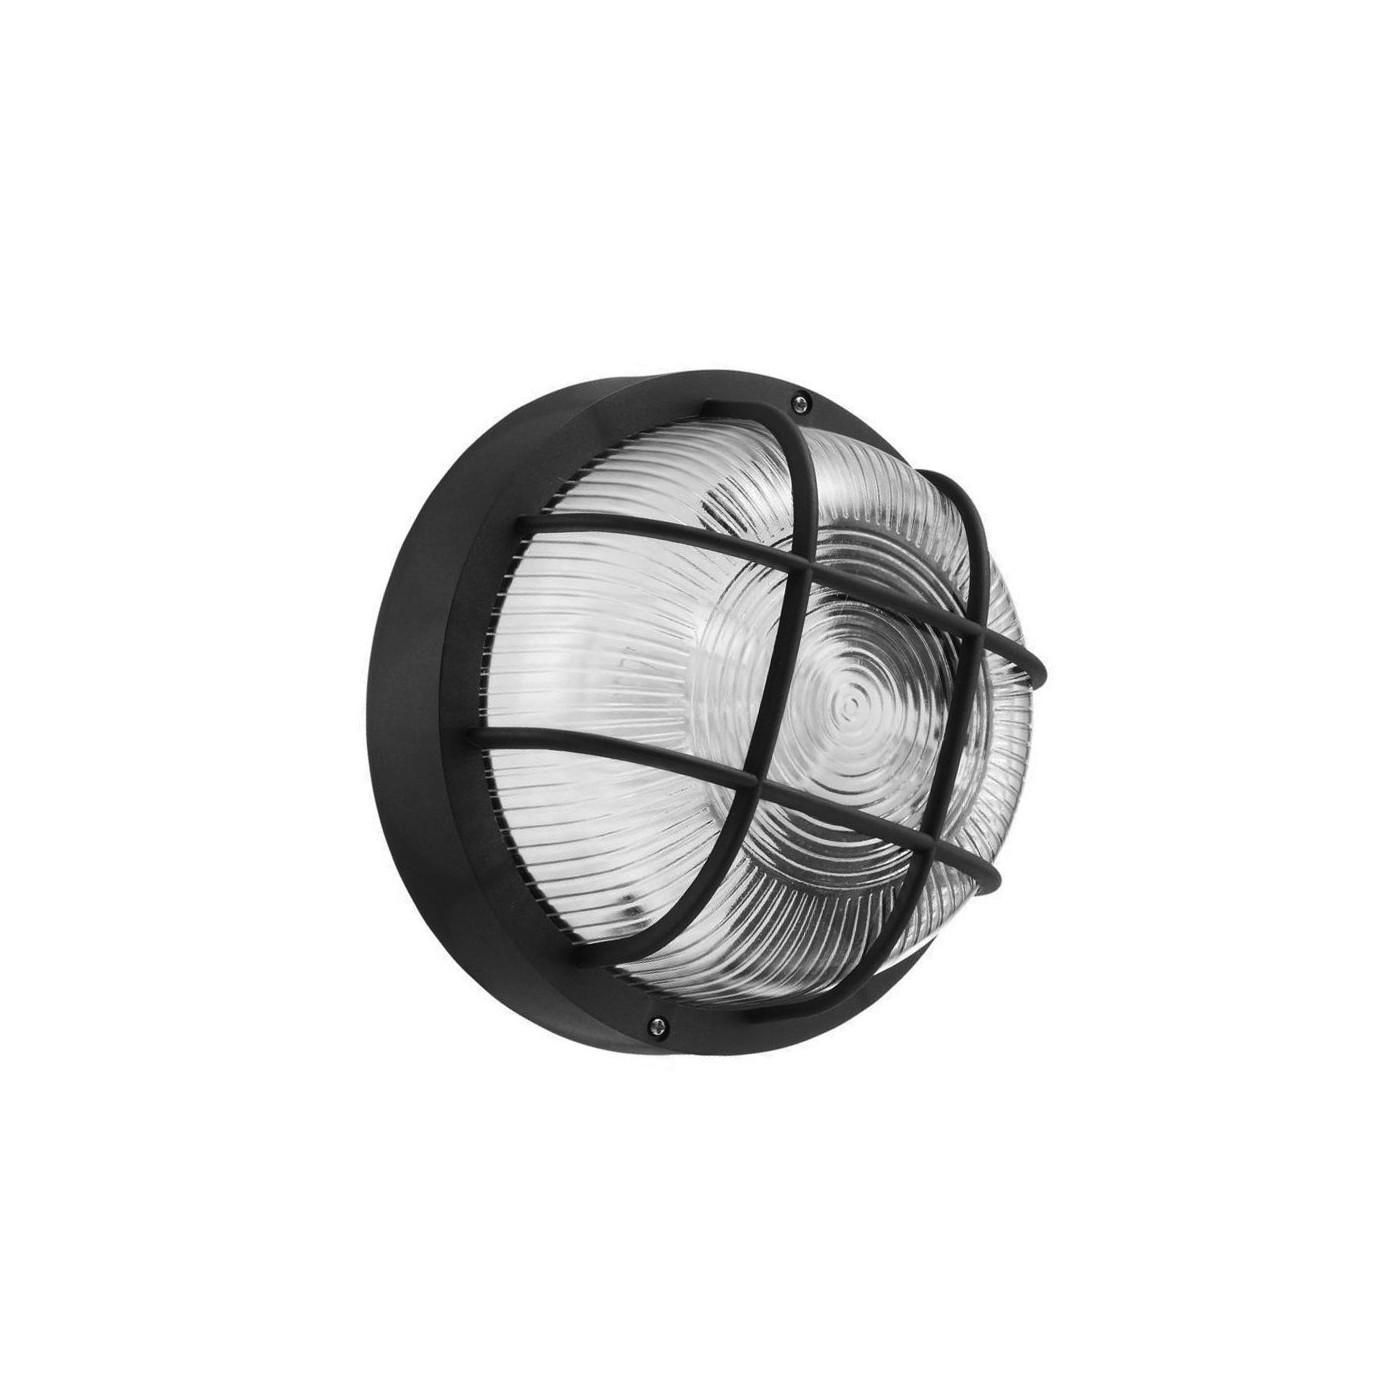 Lámpara de exterior redonda de diana (bulleye), negra E27  - 1